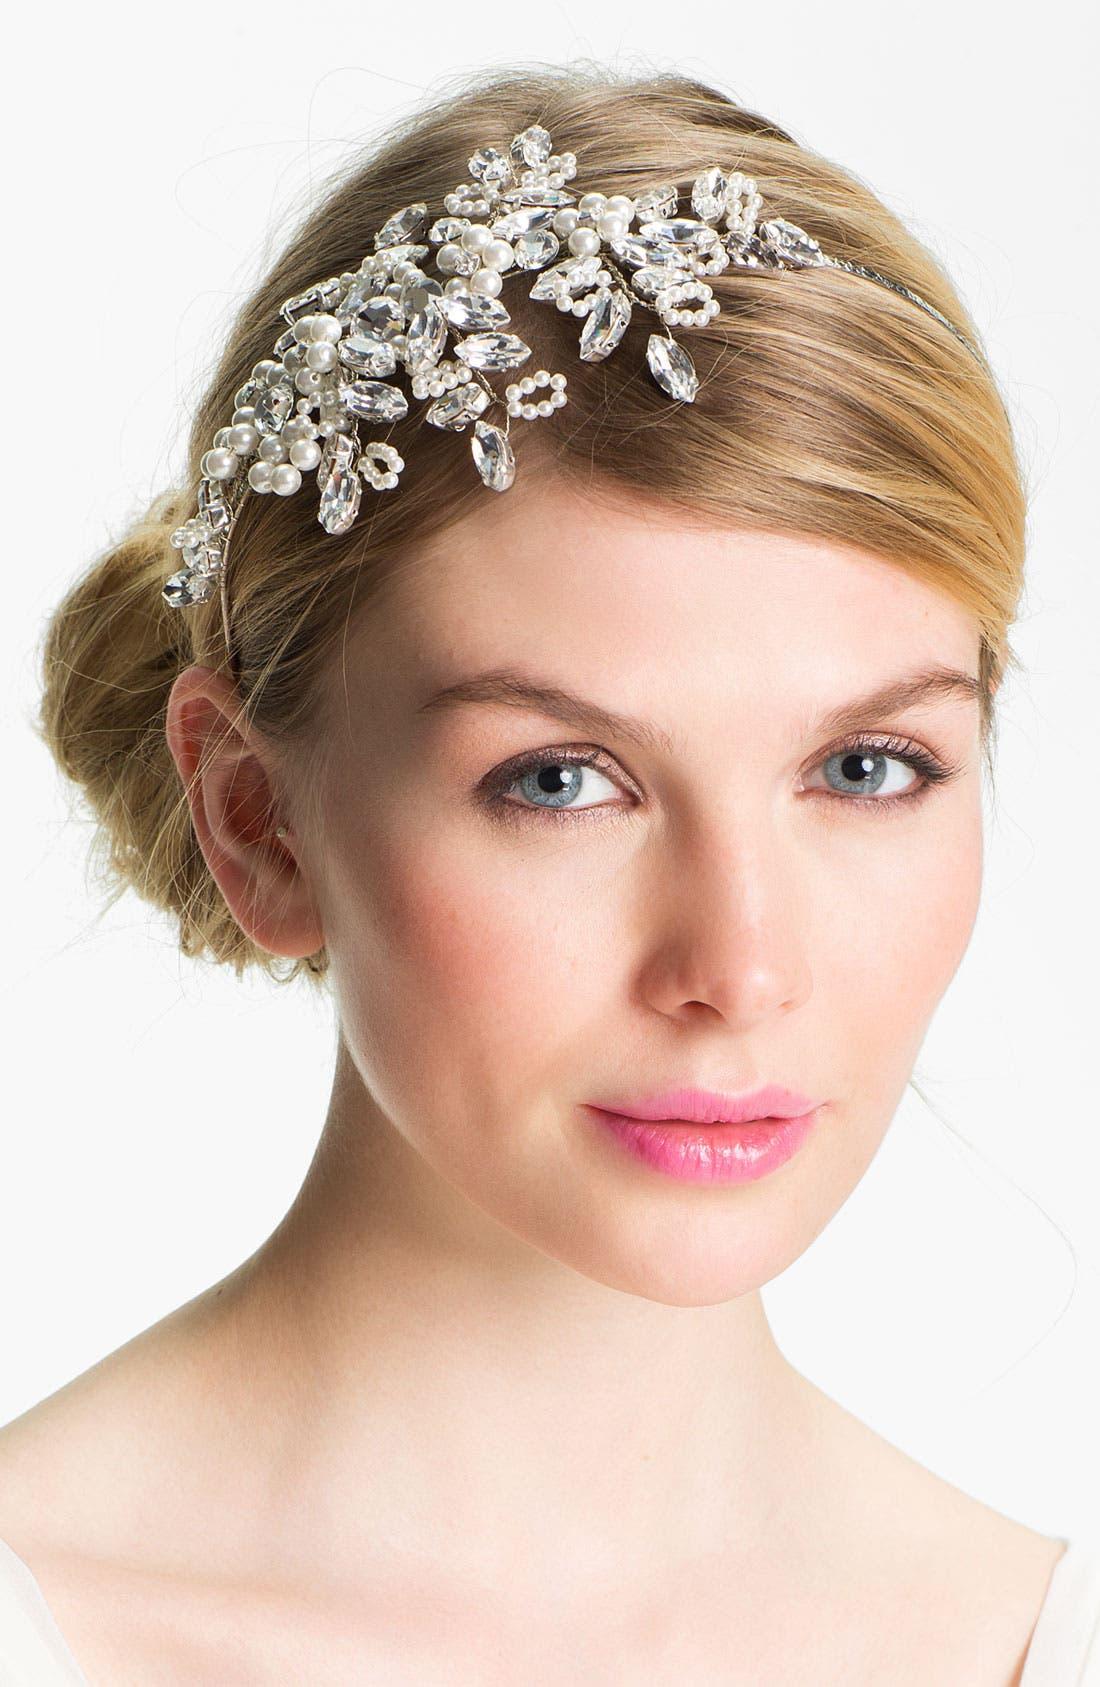 Main Image - Halo & Co Crystal Branches Headband